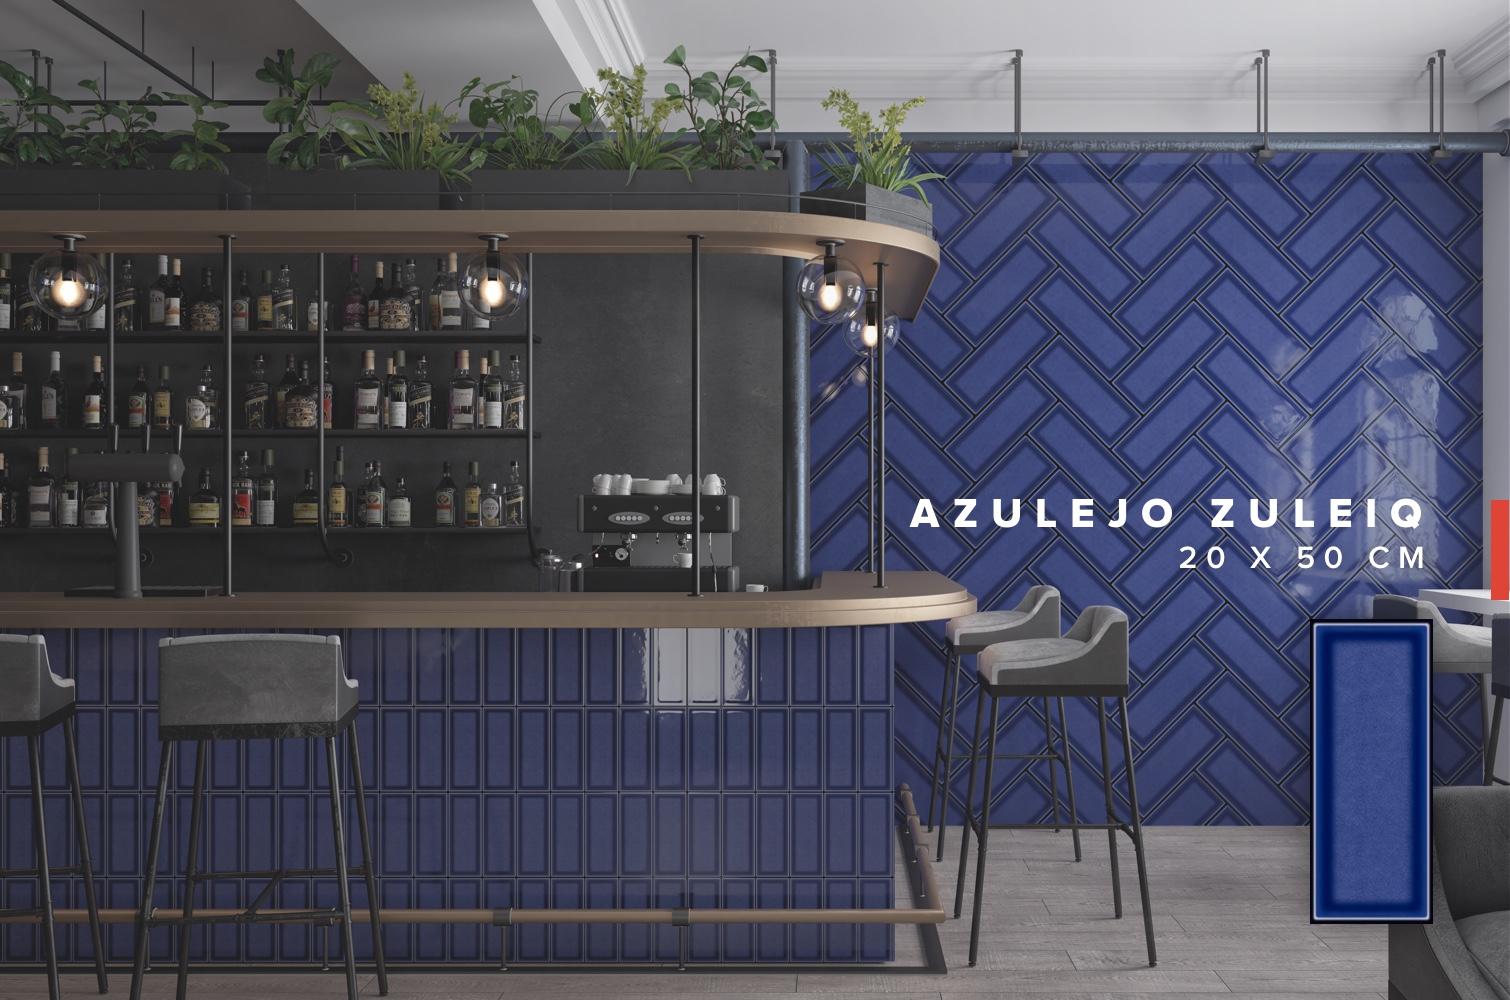 Lanzamiento Azulejo Zuleiq